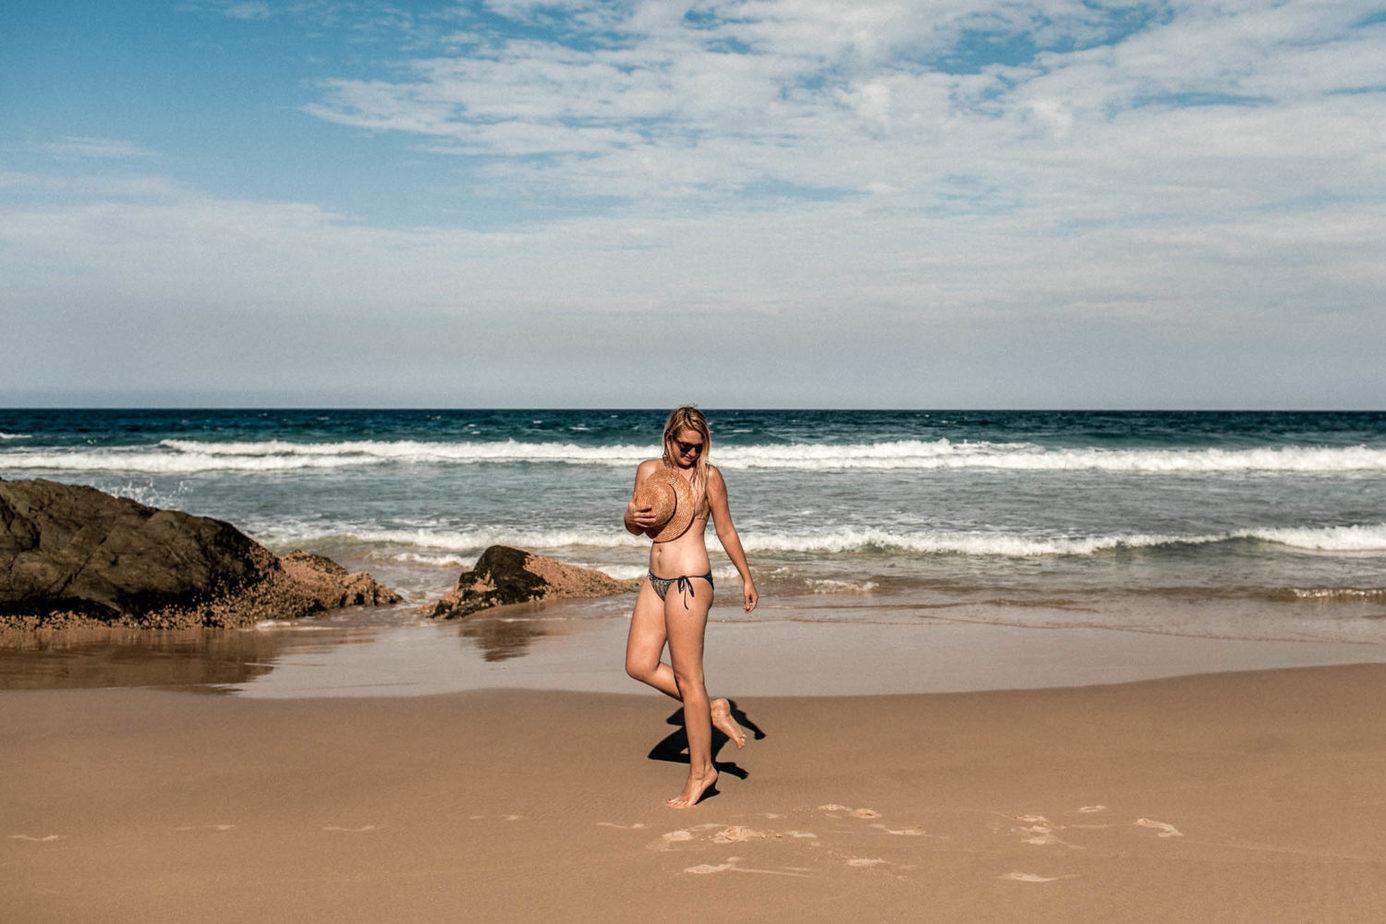 local_spots_byron_bay_deserted_beach_rooftopantics_travelblog